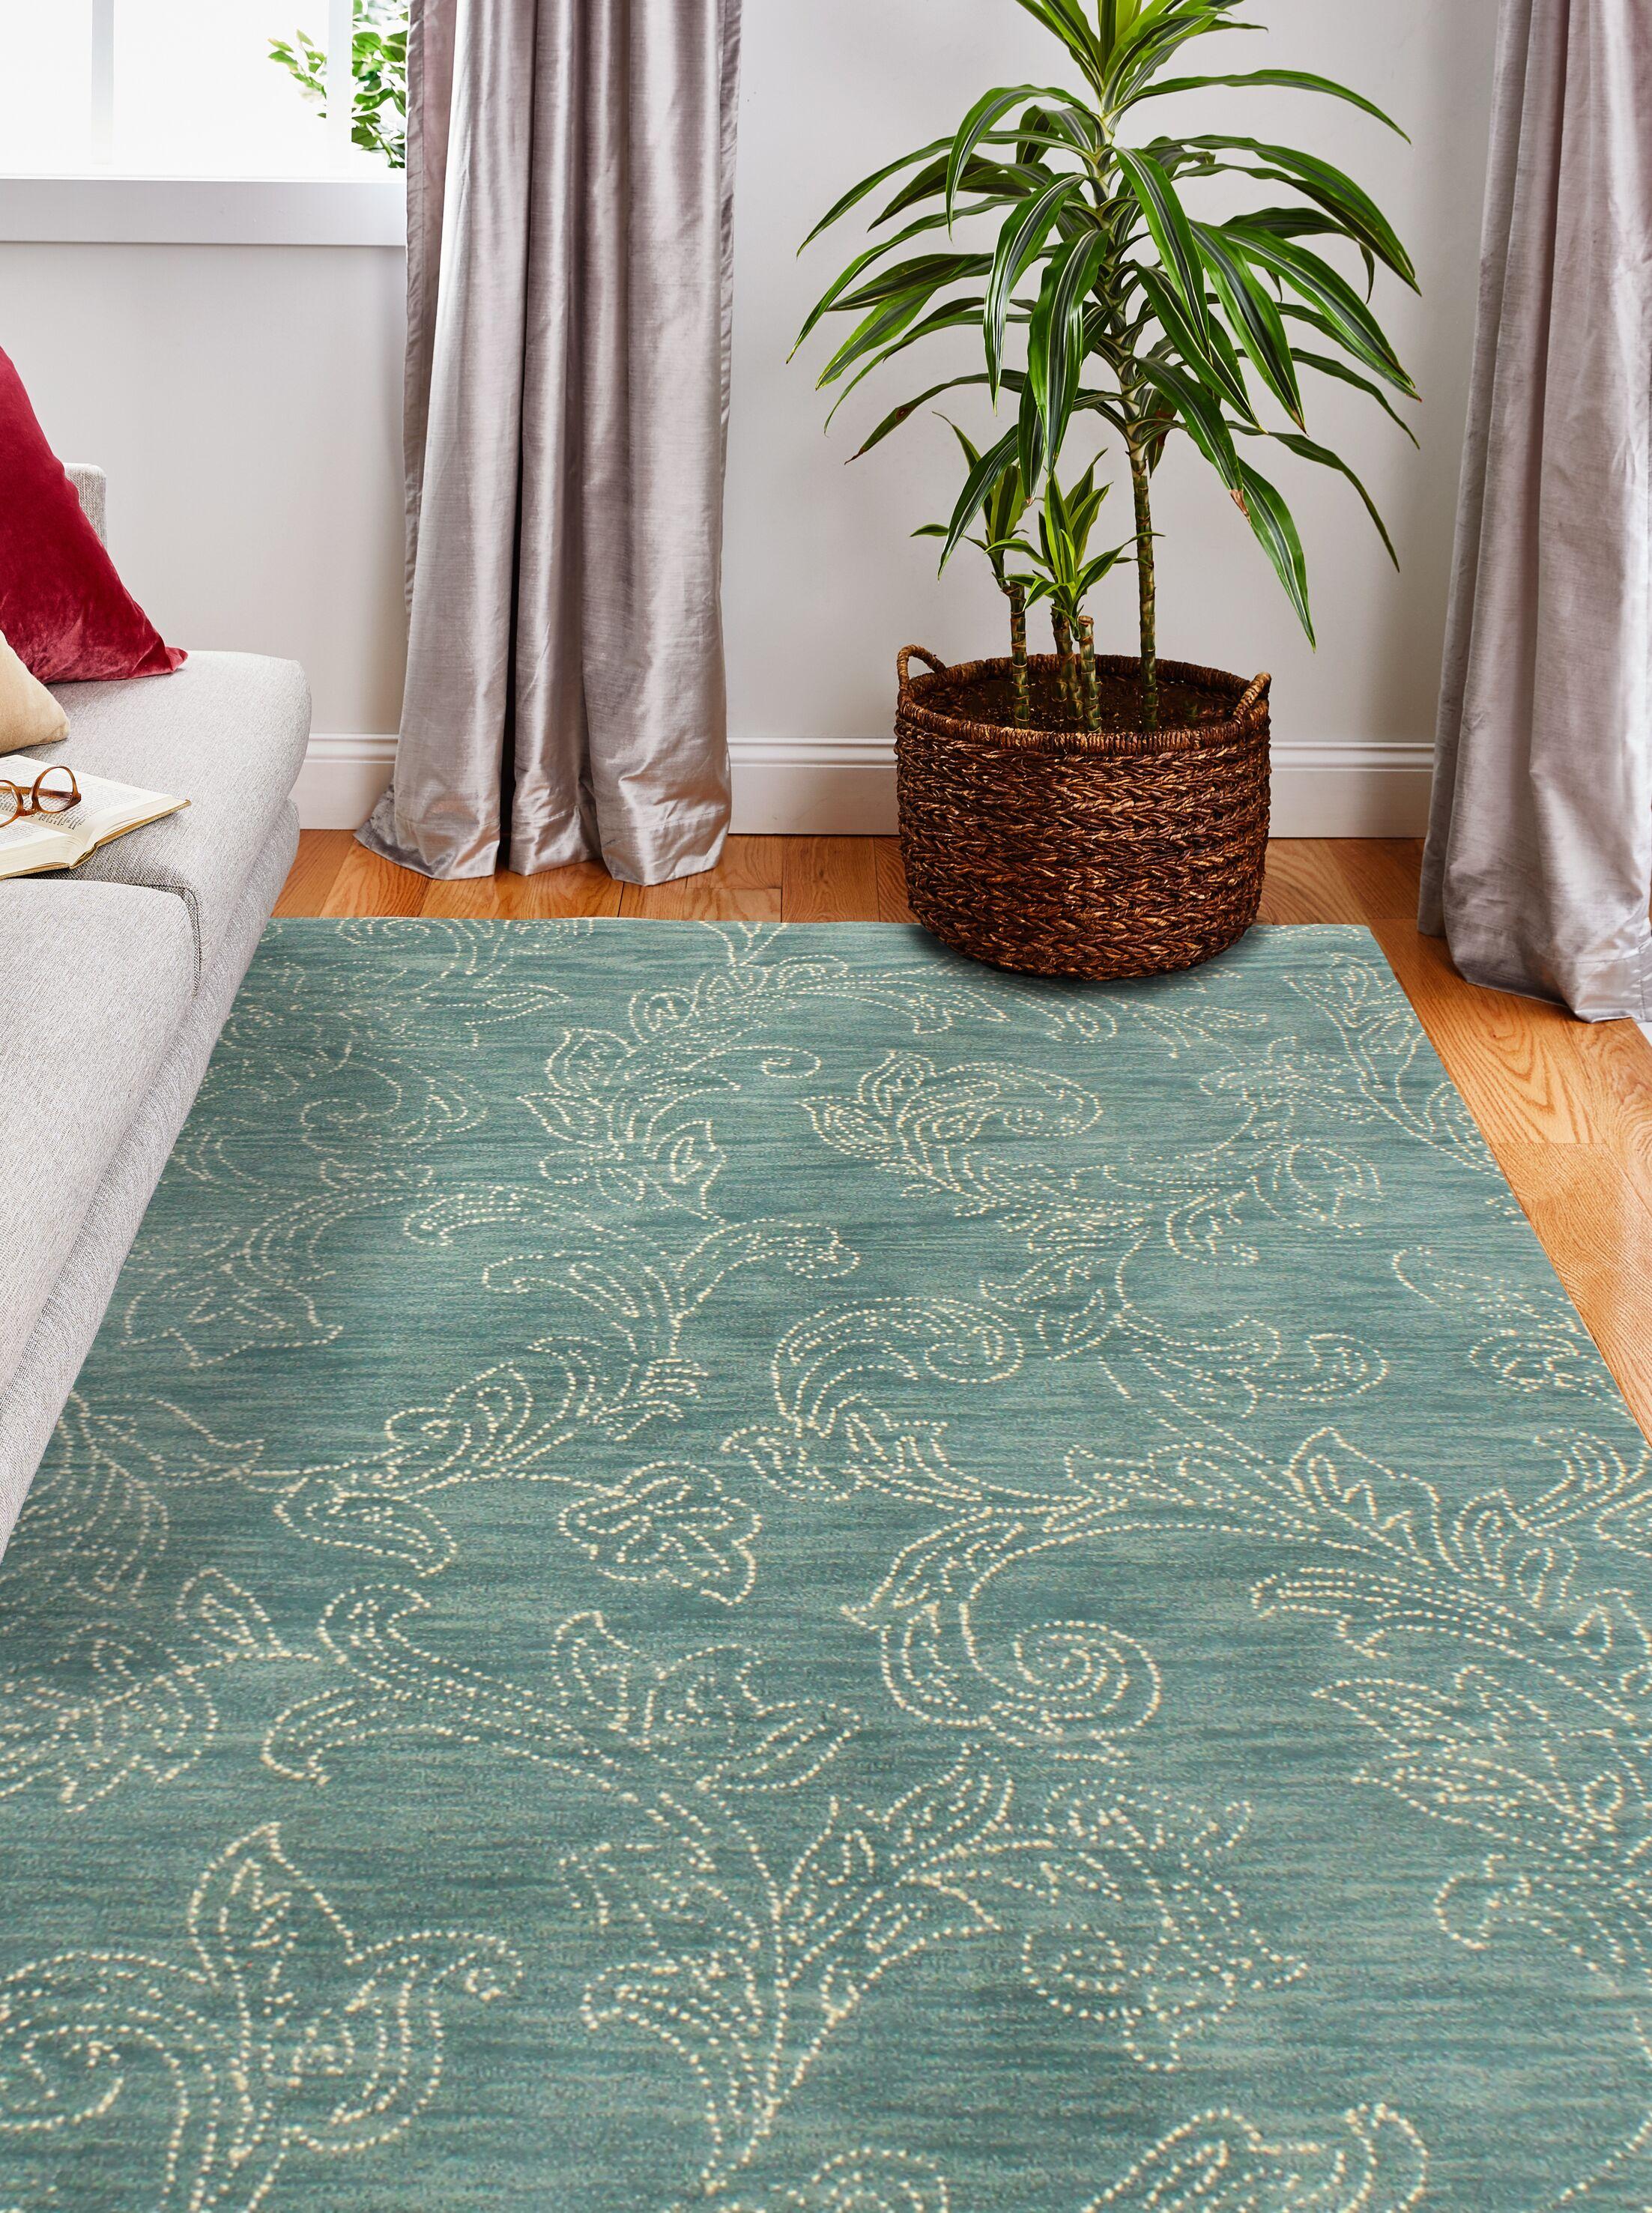 Kory Hand-Tufted Wool Teal Area Rug Rug Size: 8'6